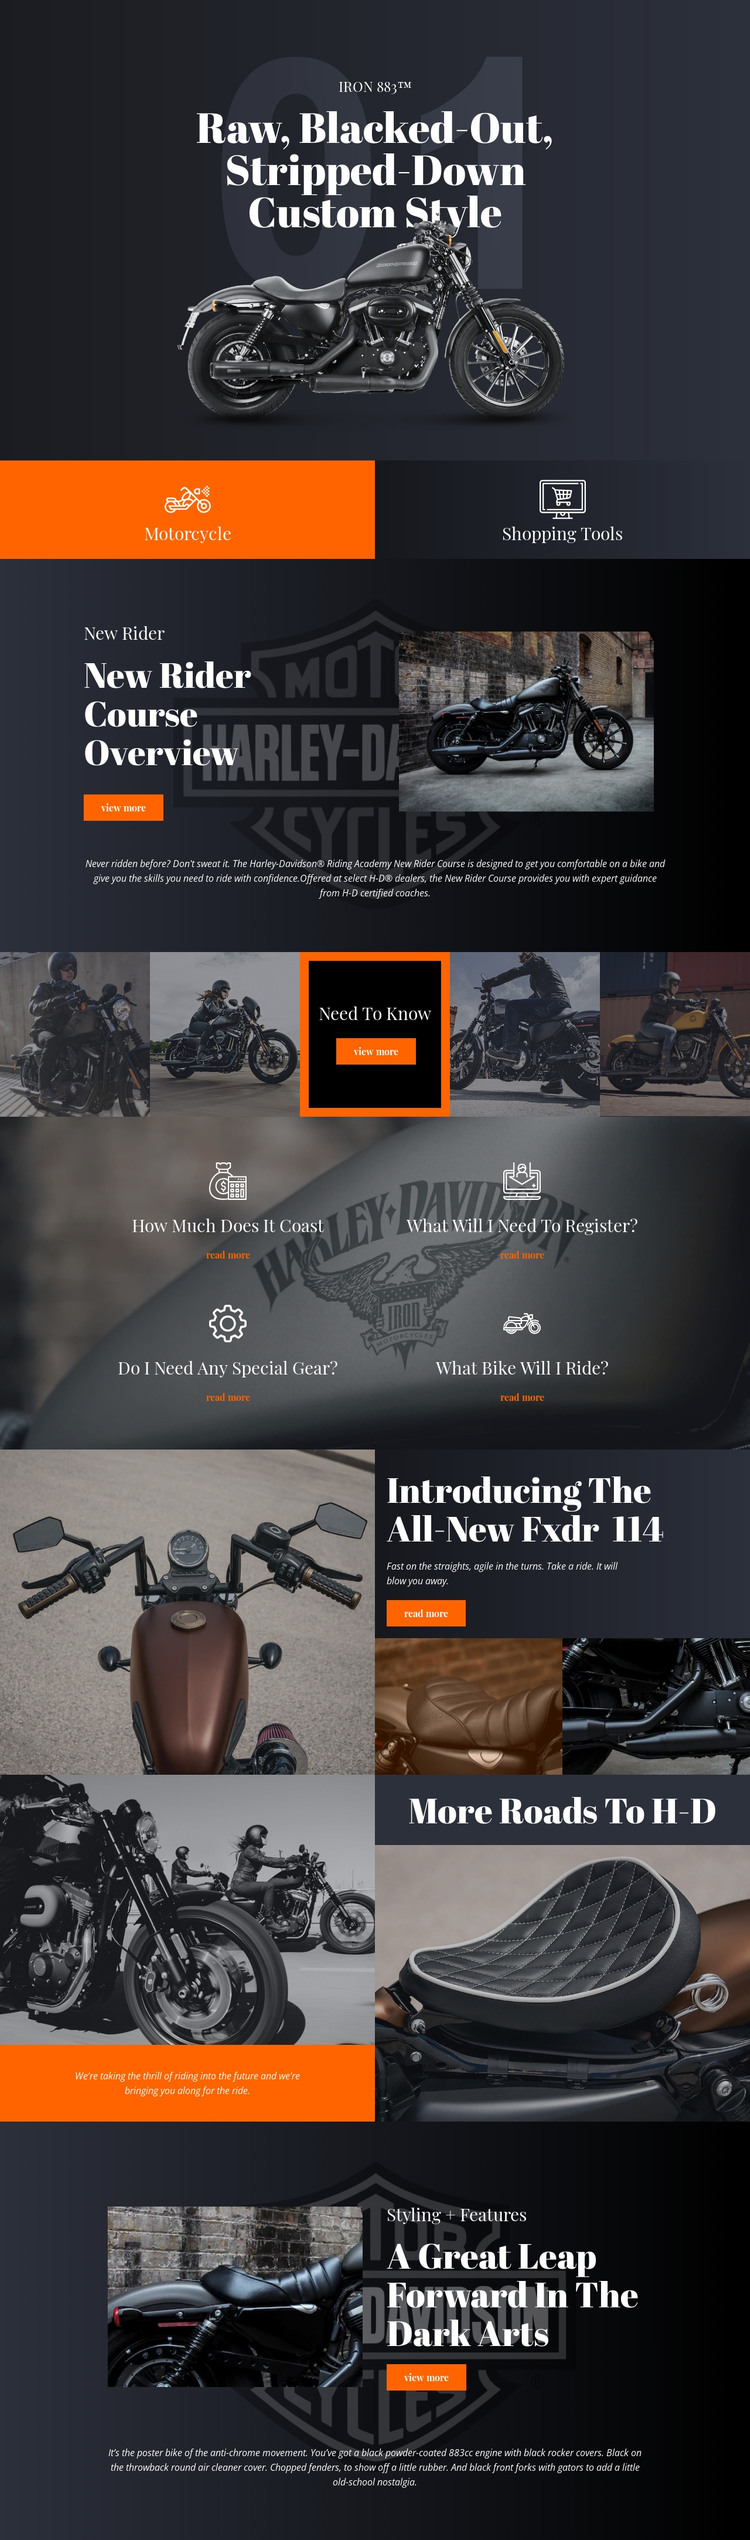 Harley Davidson HTML Template